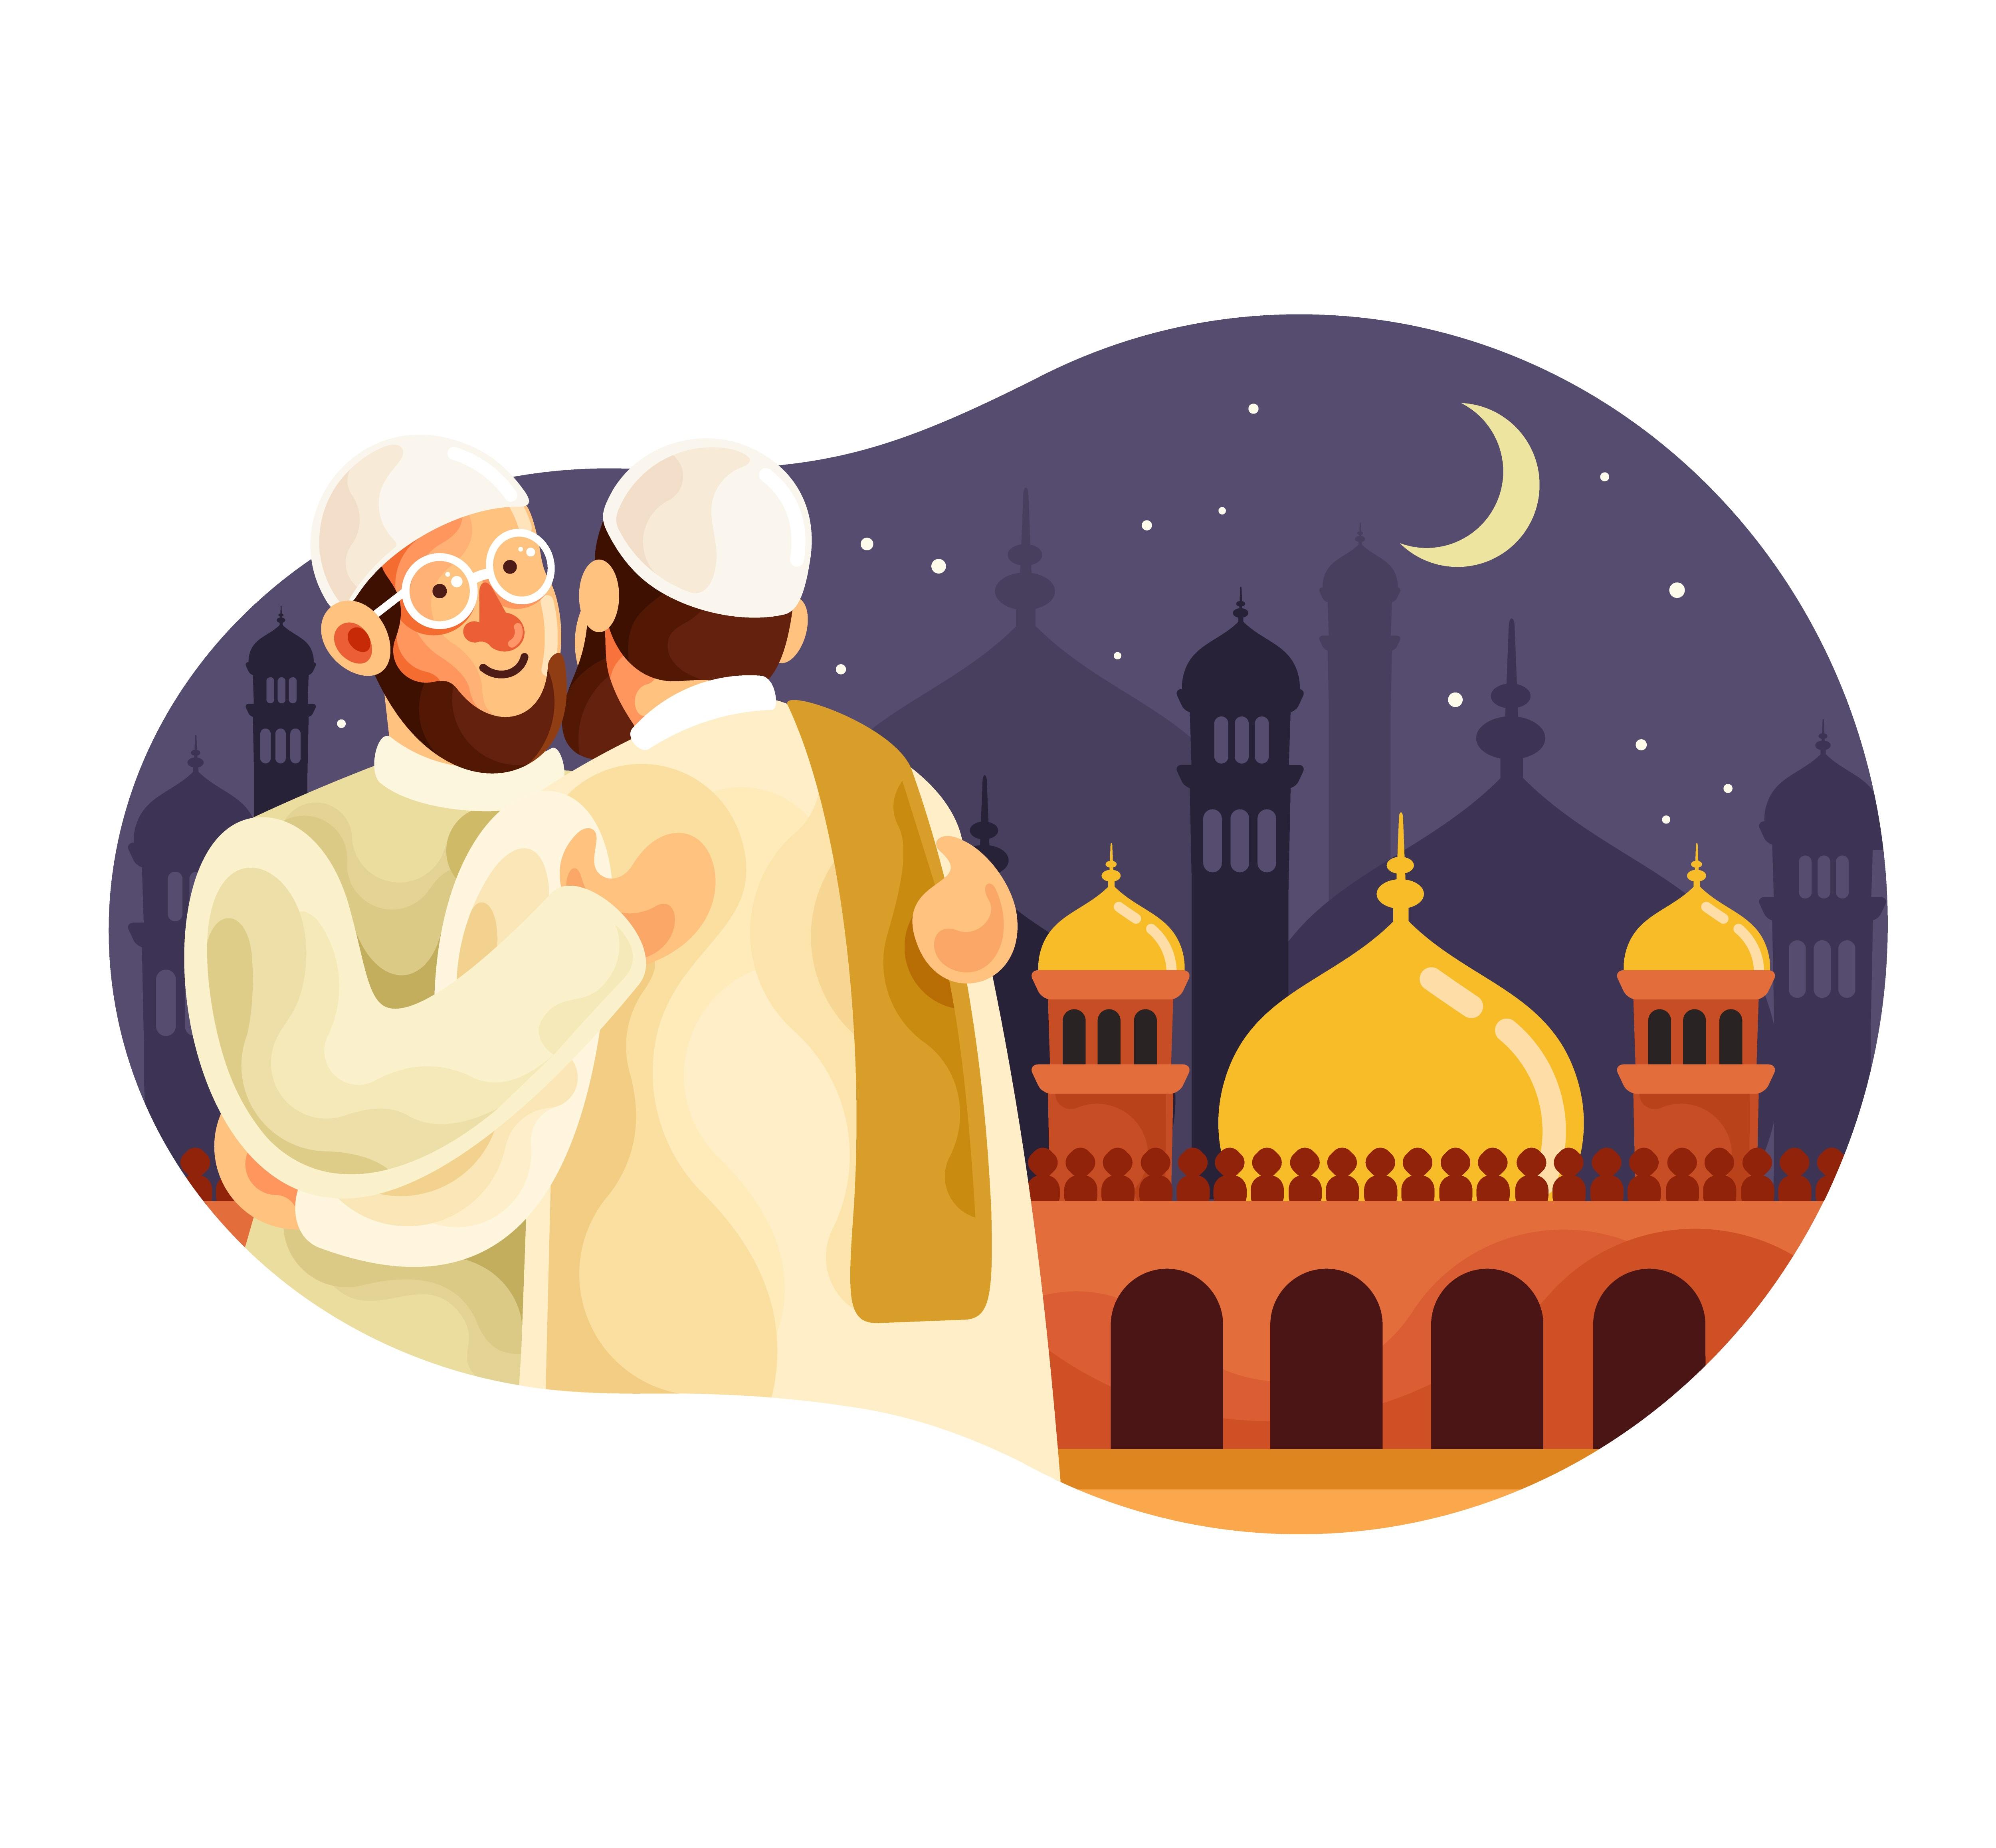 For Whom Eid Prayer is Wajib?